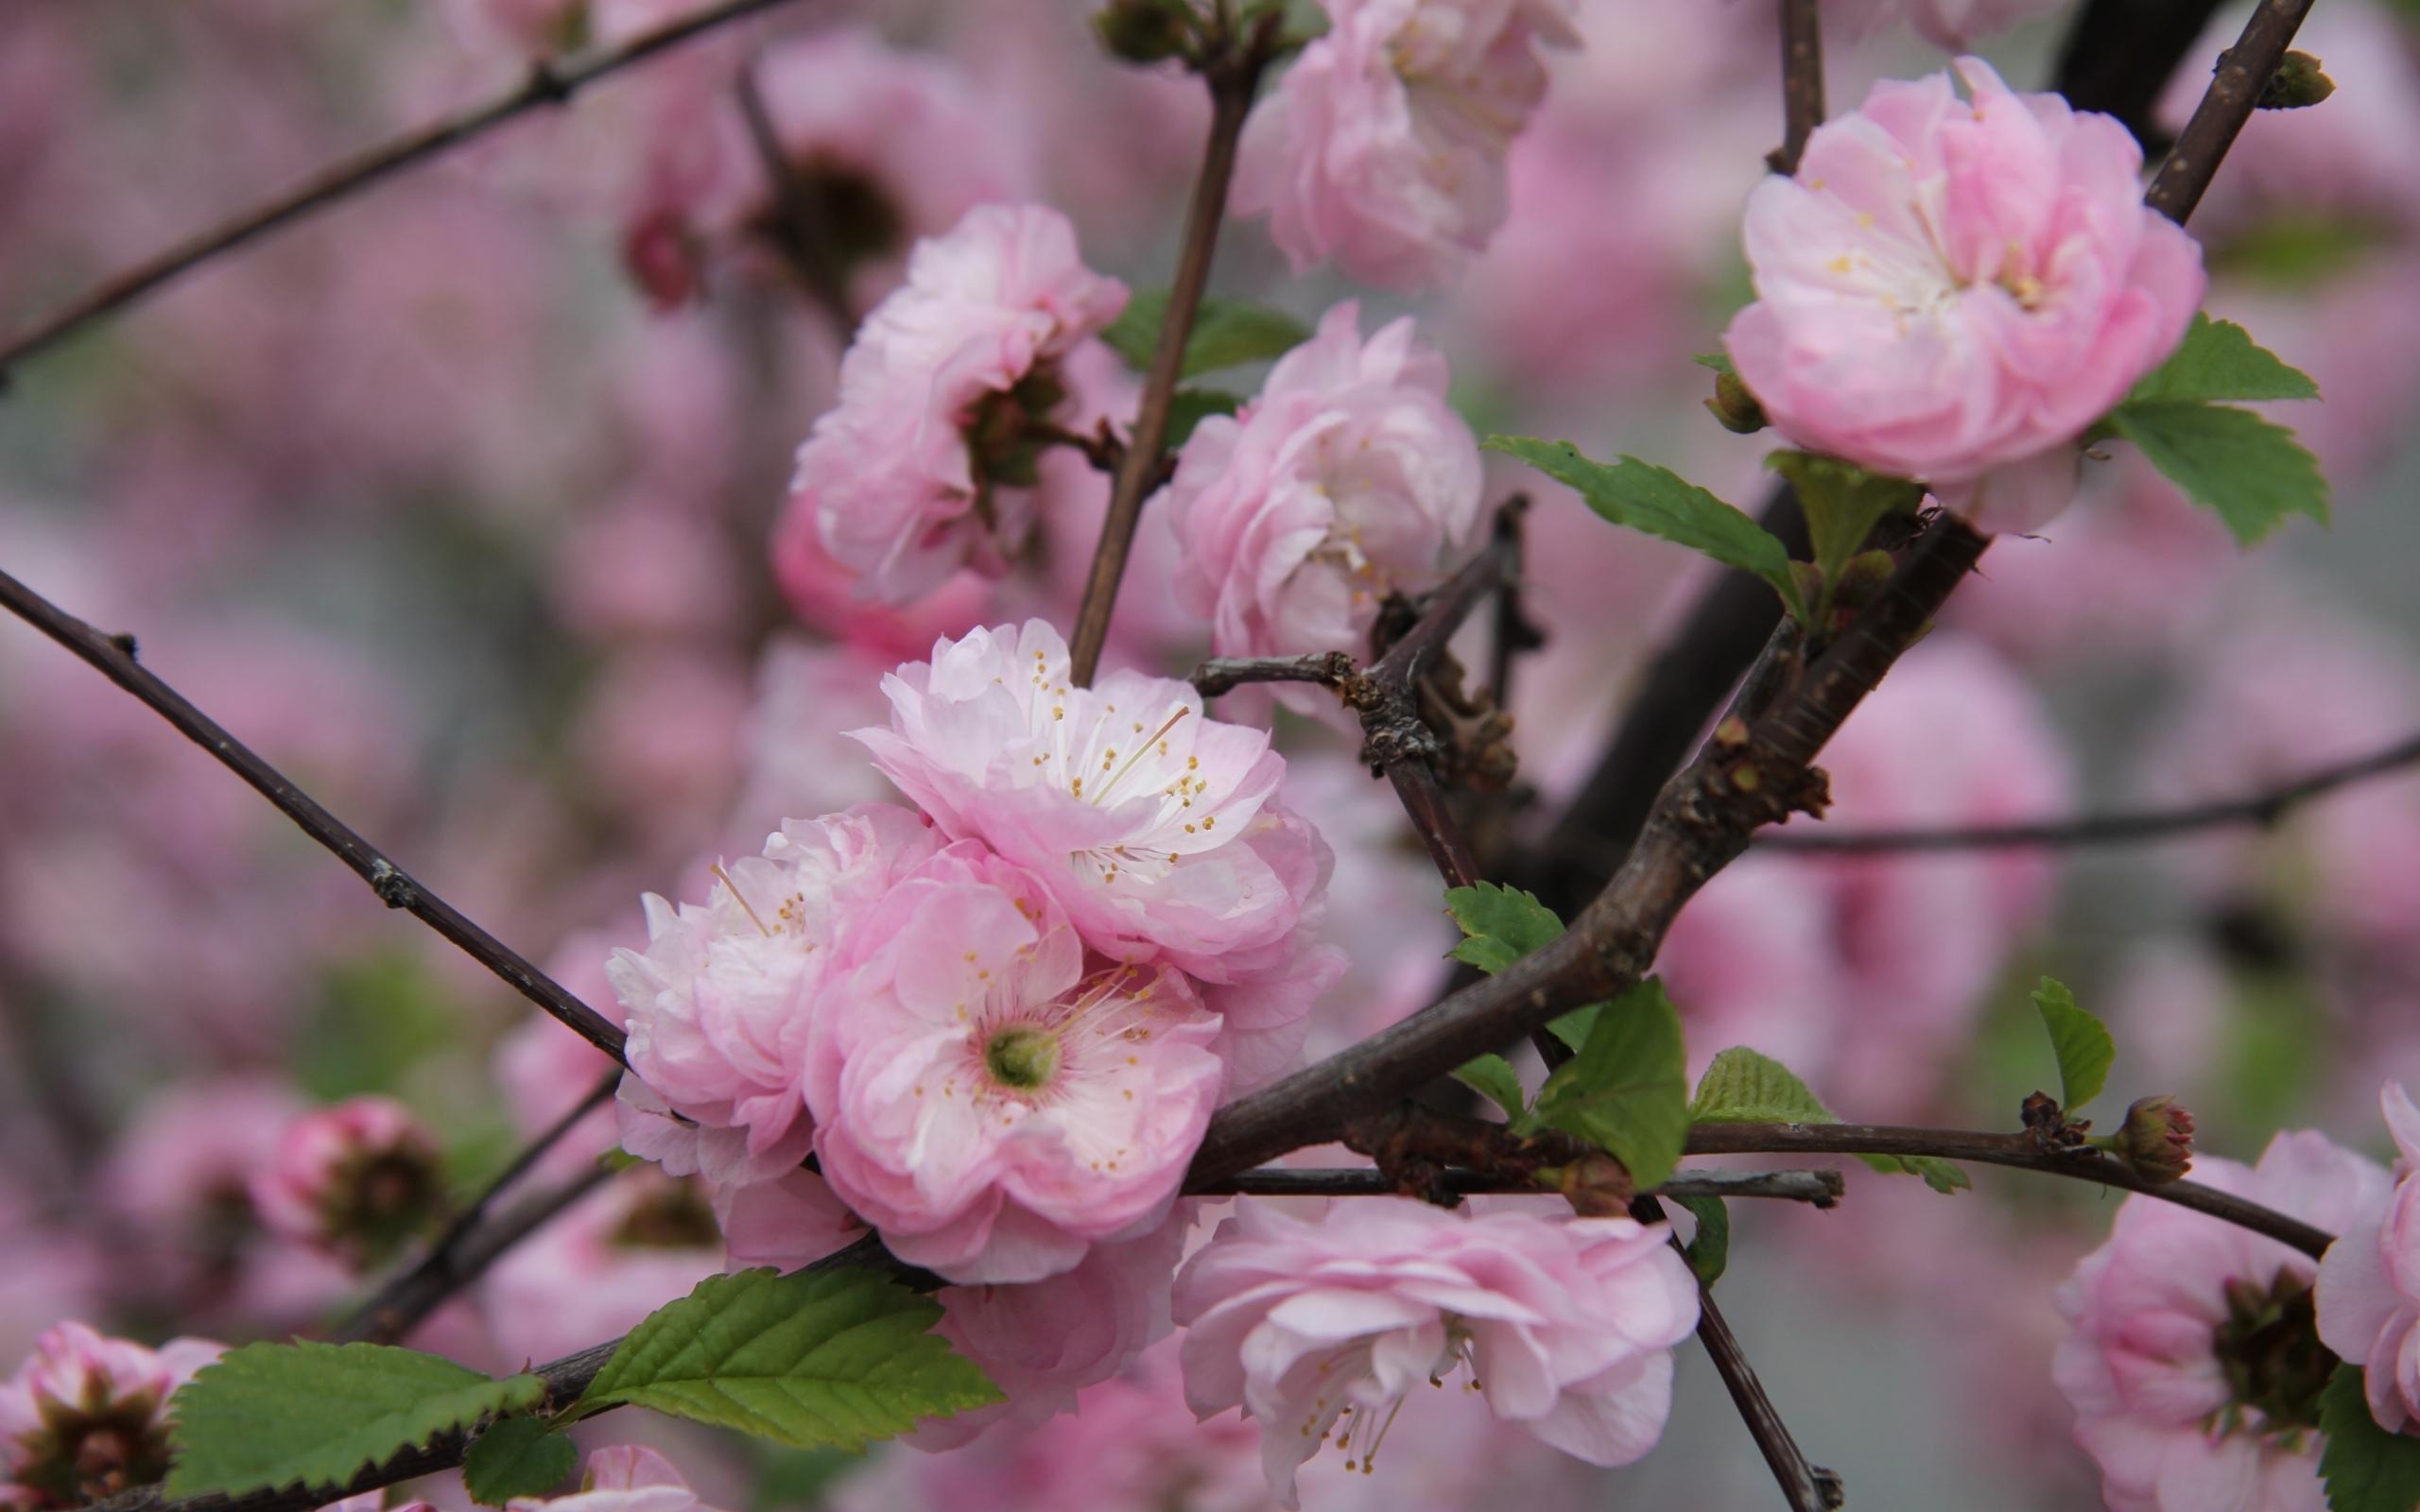 27324 descargar fondo de pantalla Plantas, Flores, Árboles: protectores de pantalla e imágenes gratis